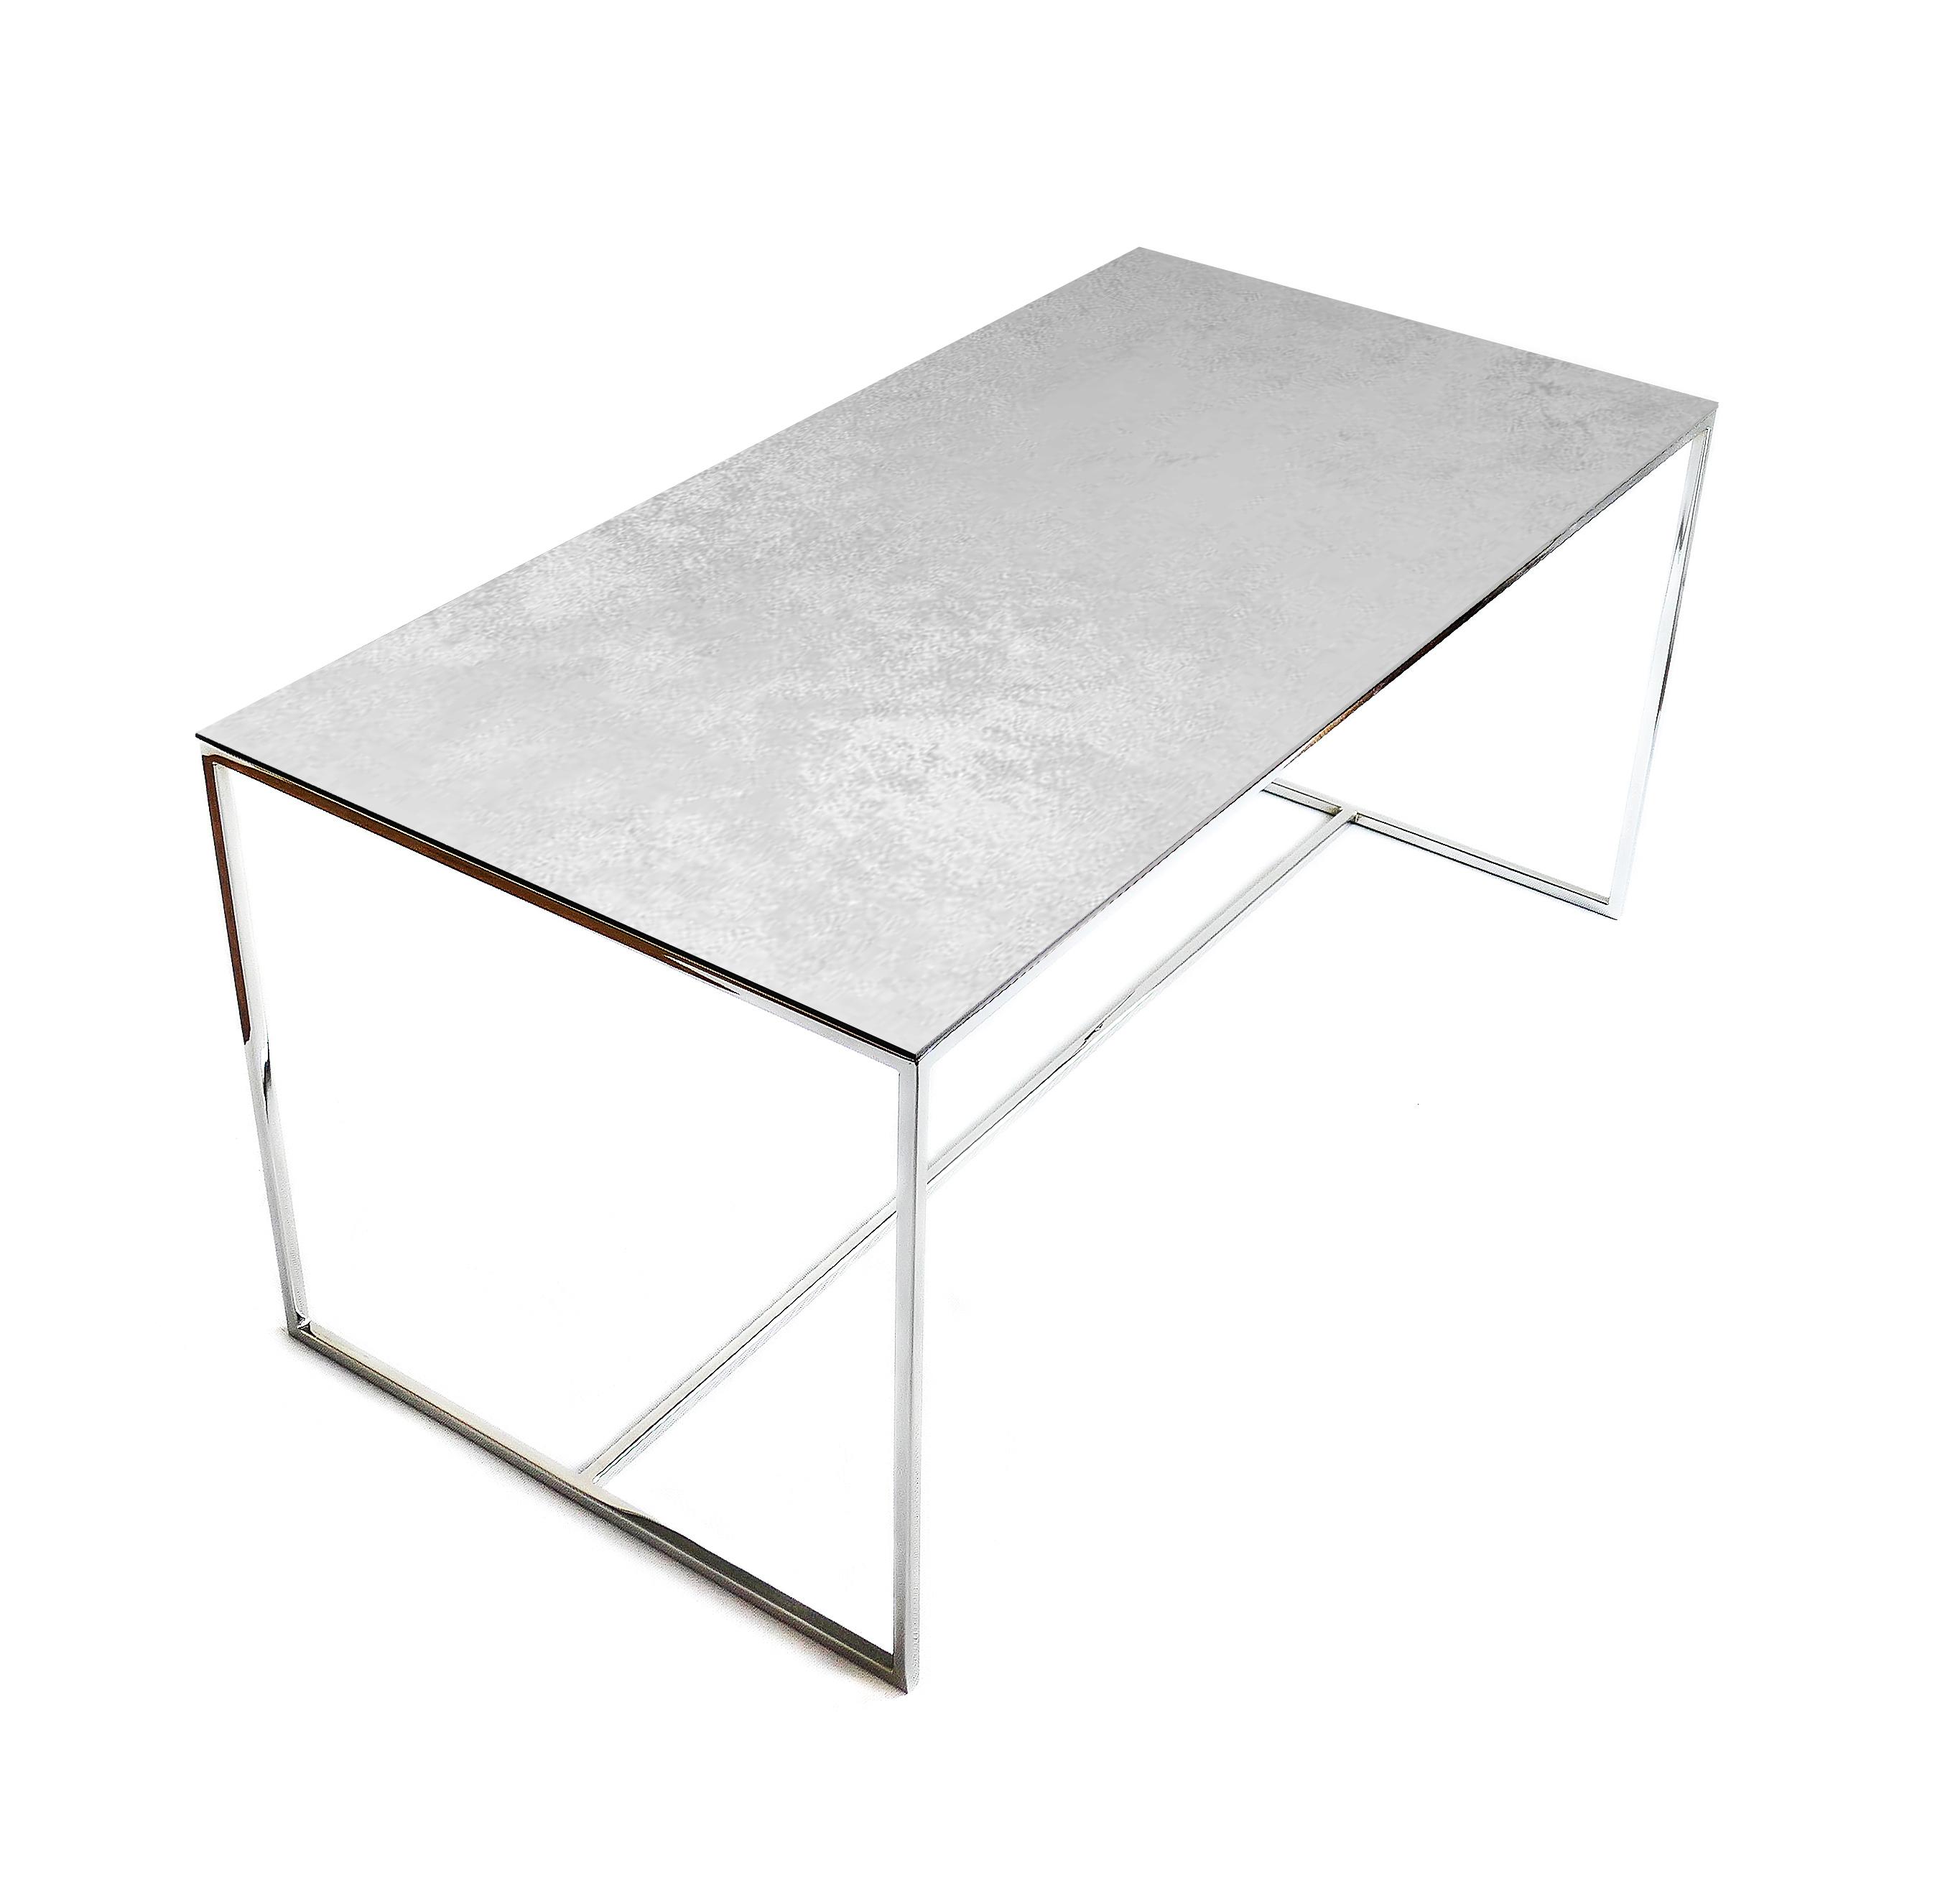 Stolik kawowy REA furniture VULCANO – blat Laminam oxide perla- wymiary 100/50/45